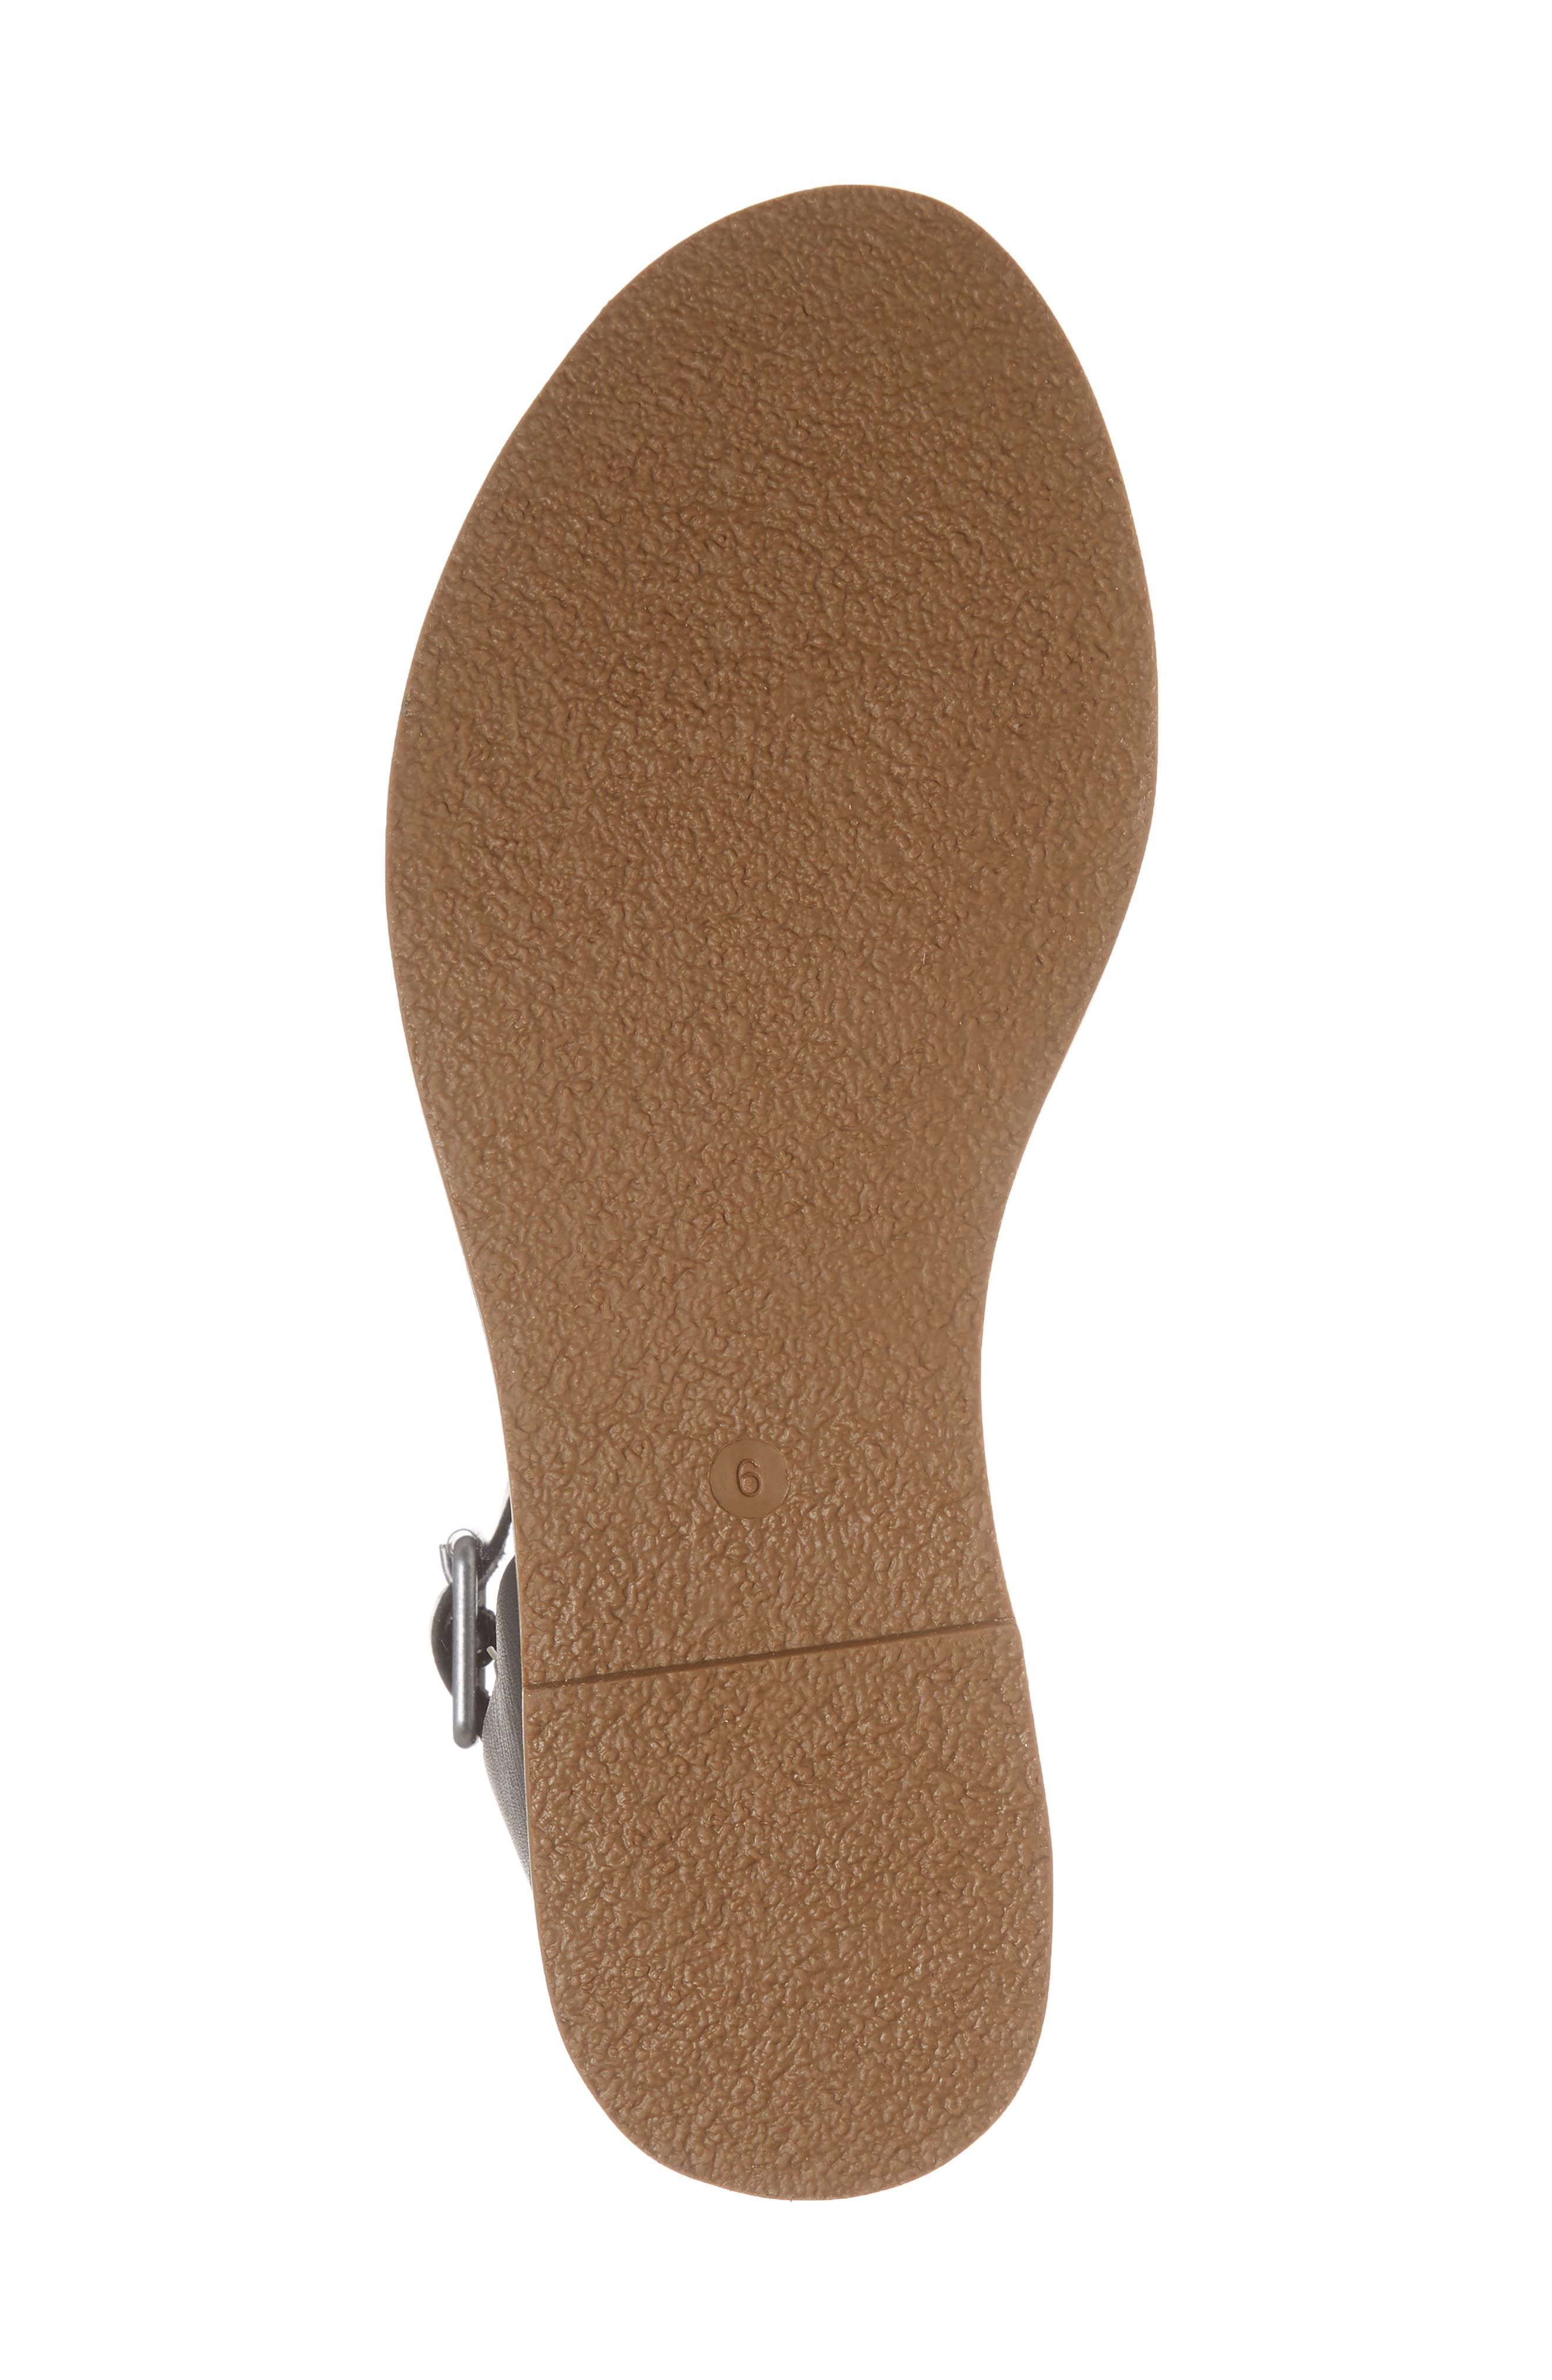 MADEWELL,                             The Boardwalk Ankle Strap Sandal,                             Alternate thumbnail 6, color,                             TRUE BLACK LEATHER